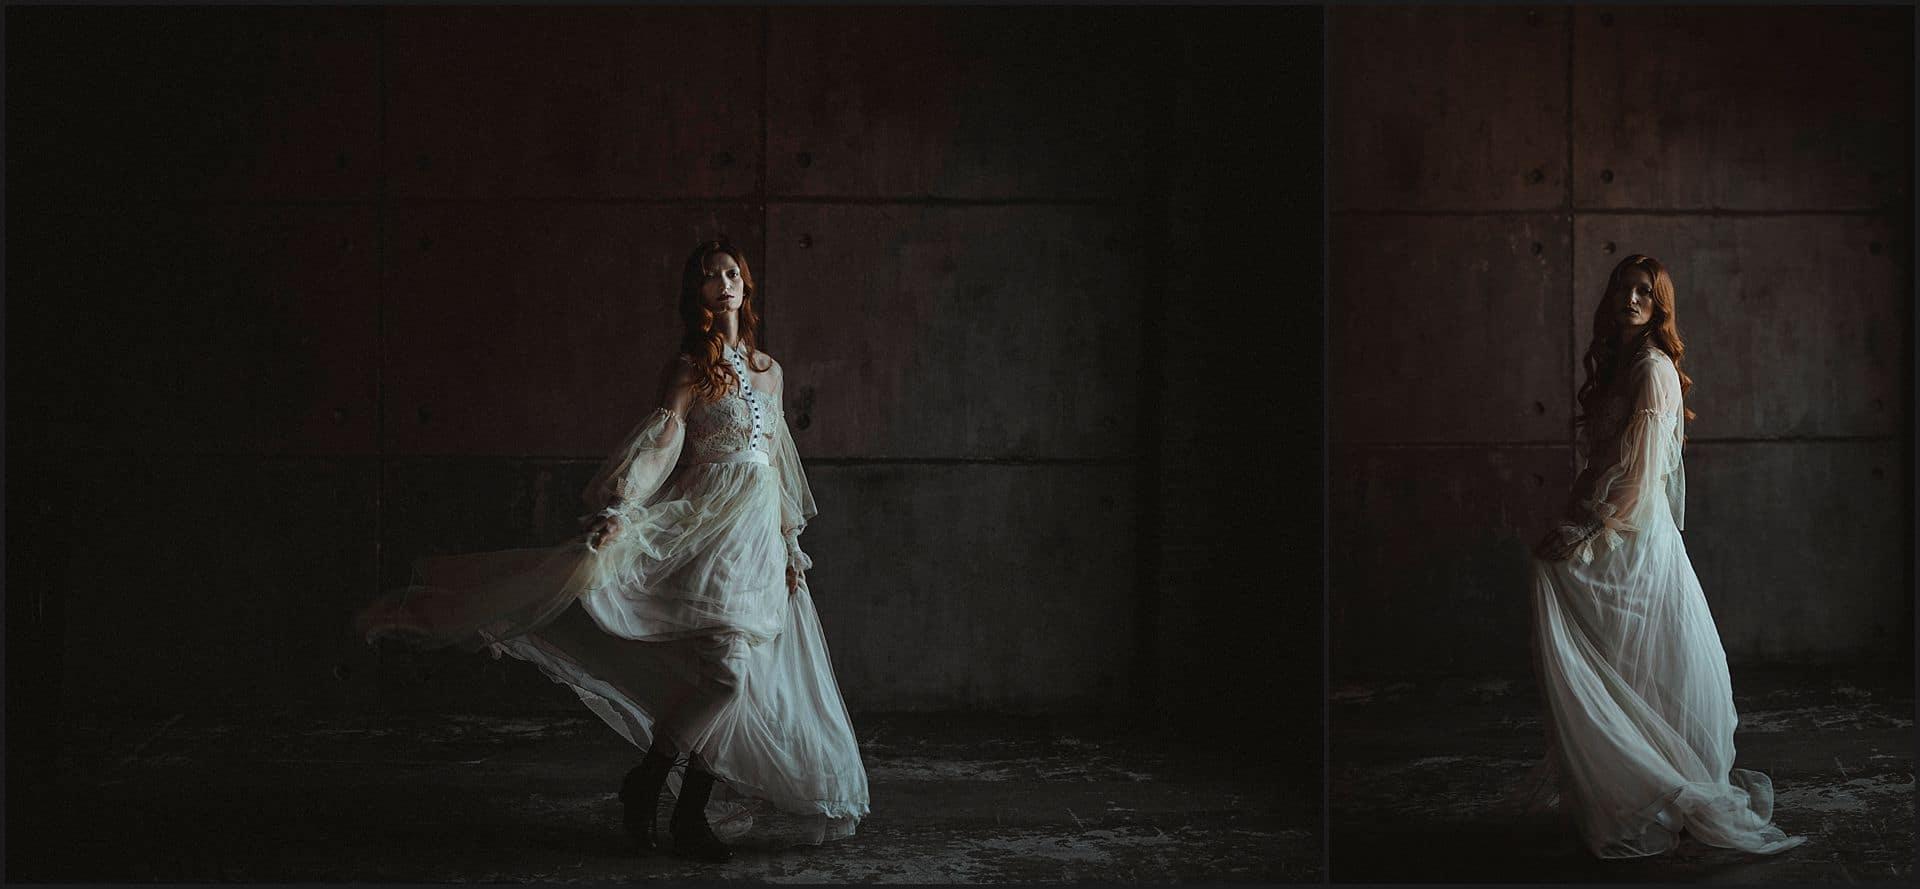 wedding gown, dress, bride portrait, dance, unconventional wedding, cross studio, milan, wedding photographer, wedding in italy